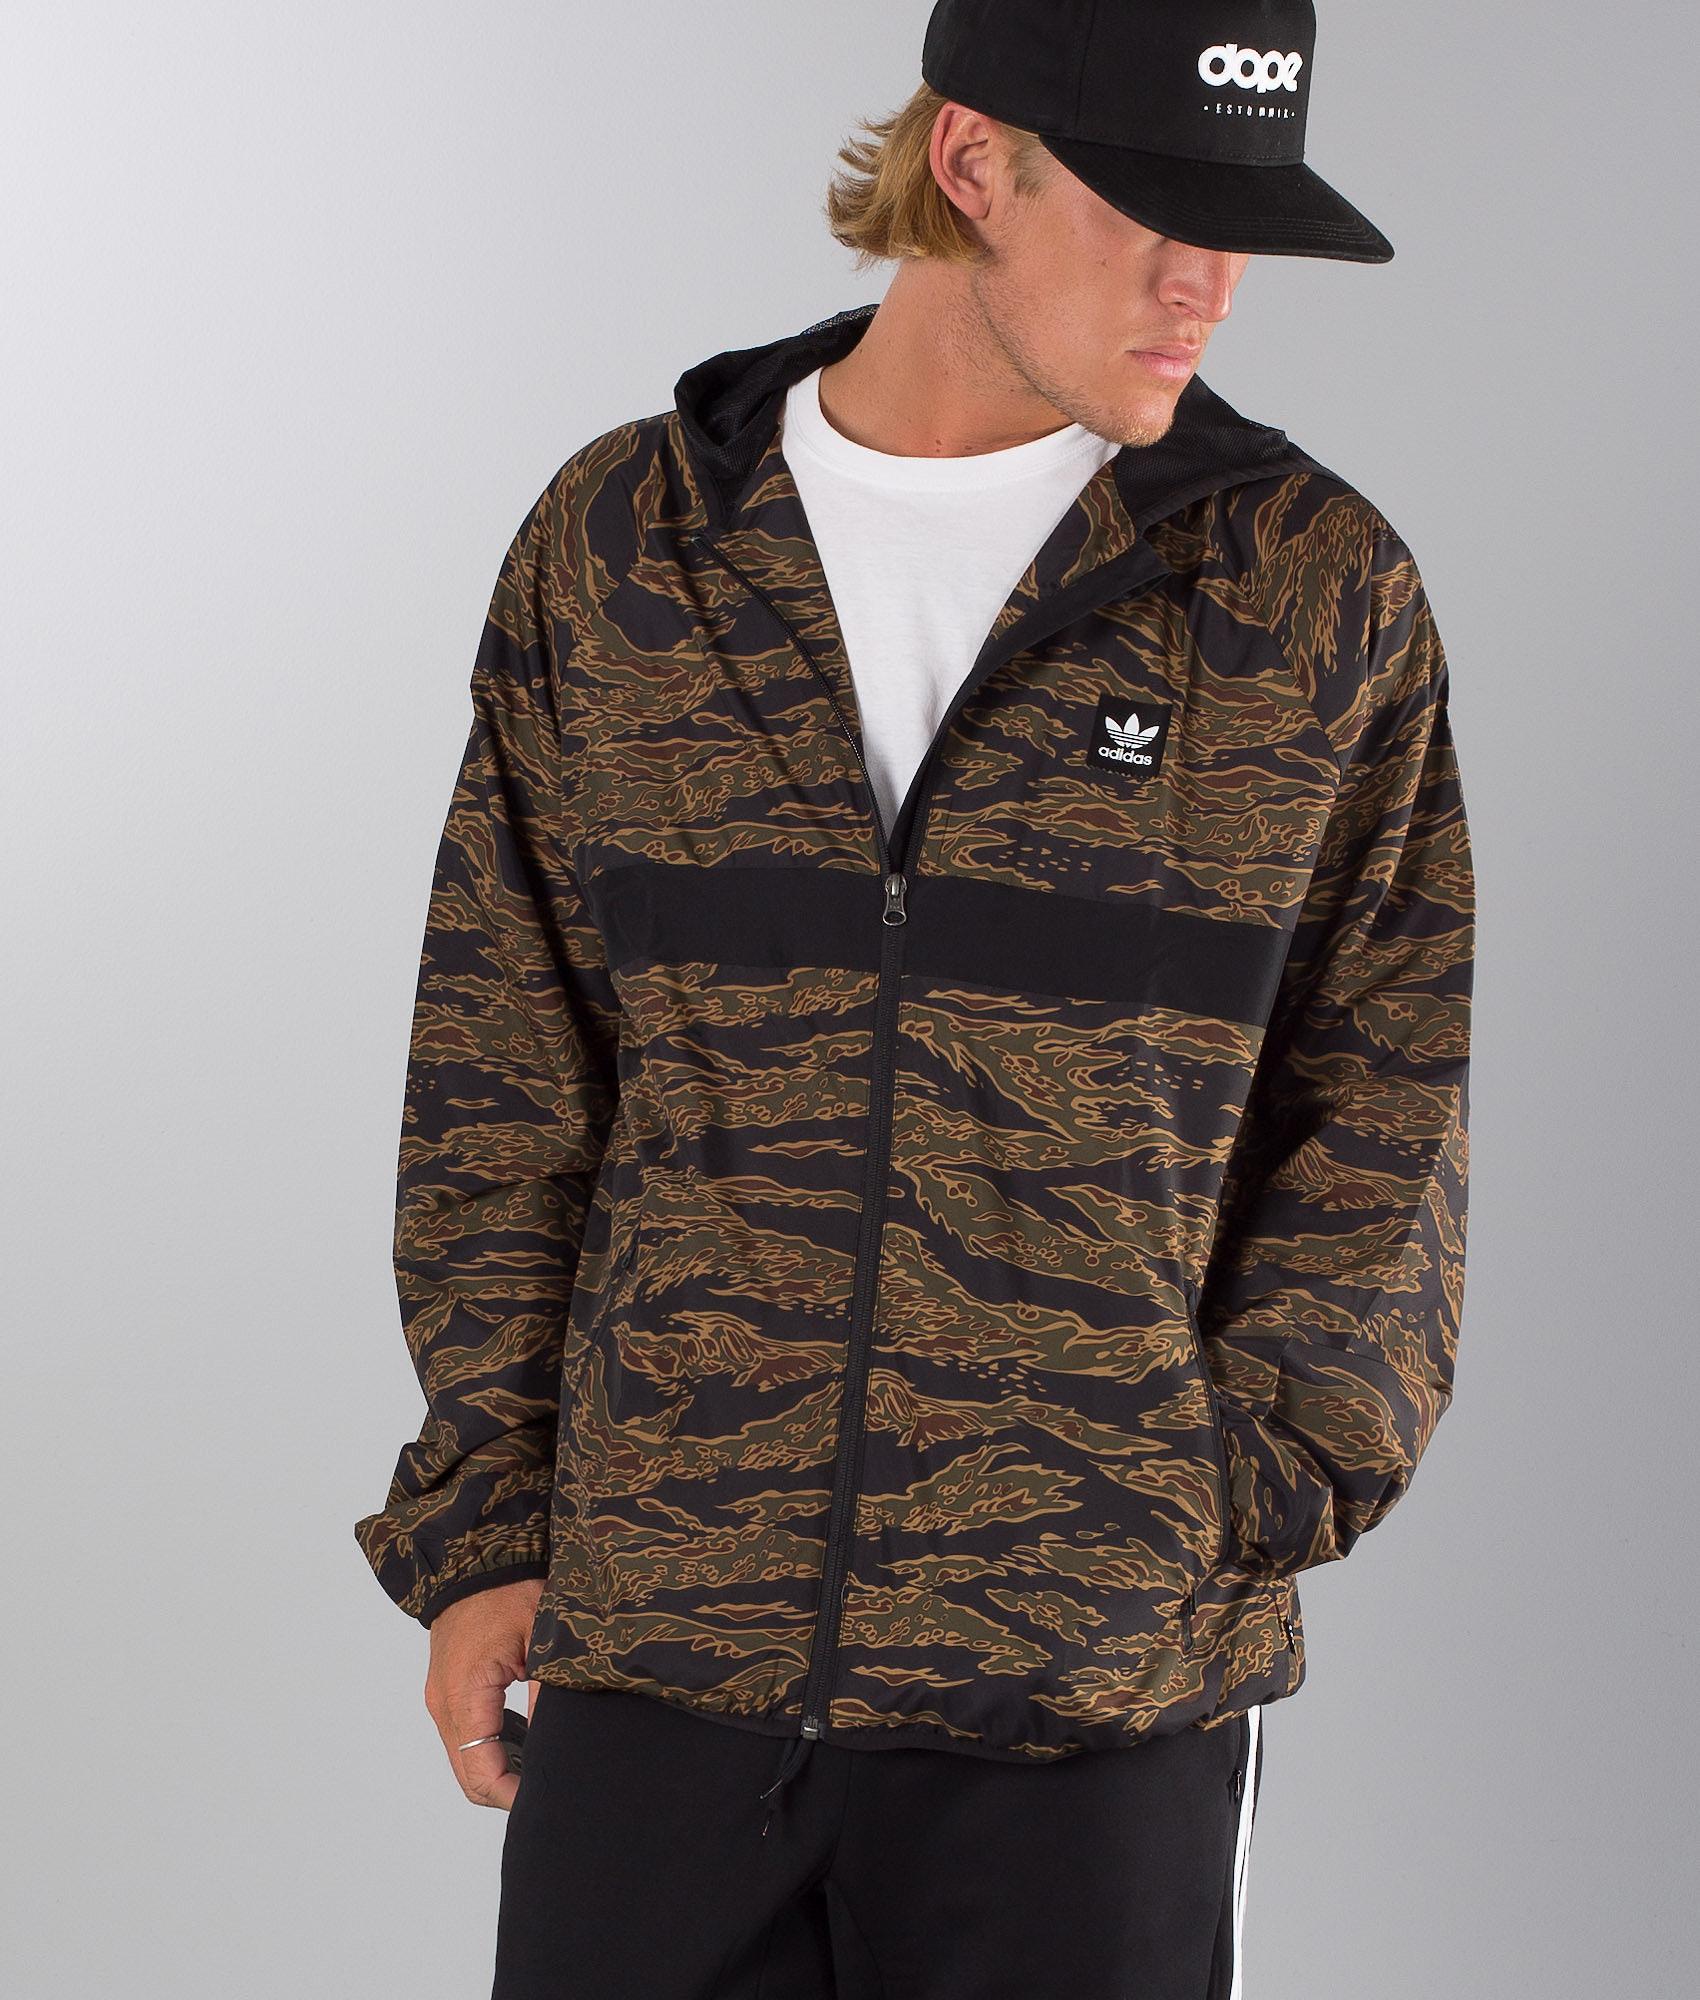 a17c115378 Adidas Skateboarding Camo Blackbird Packable Jacket Camo Print Black ...